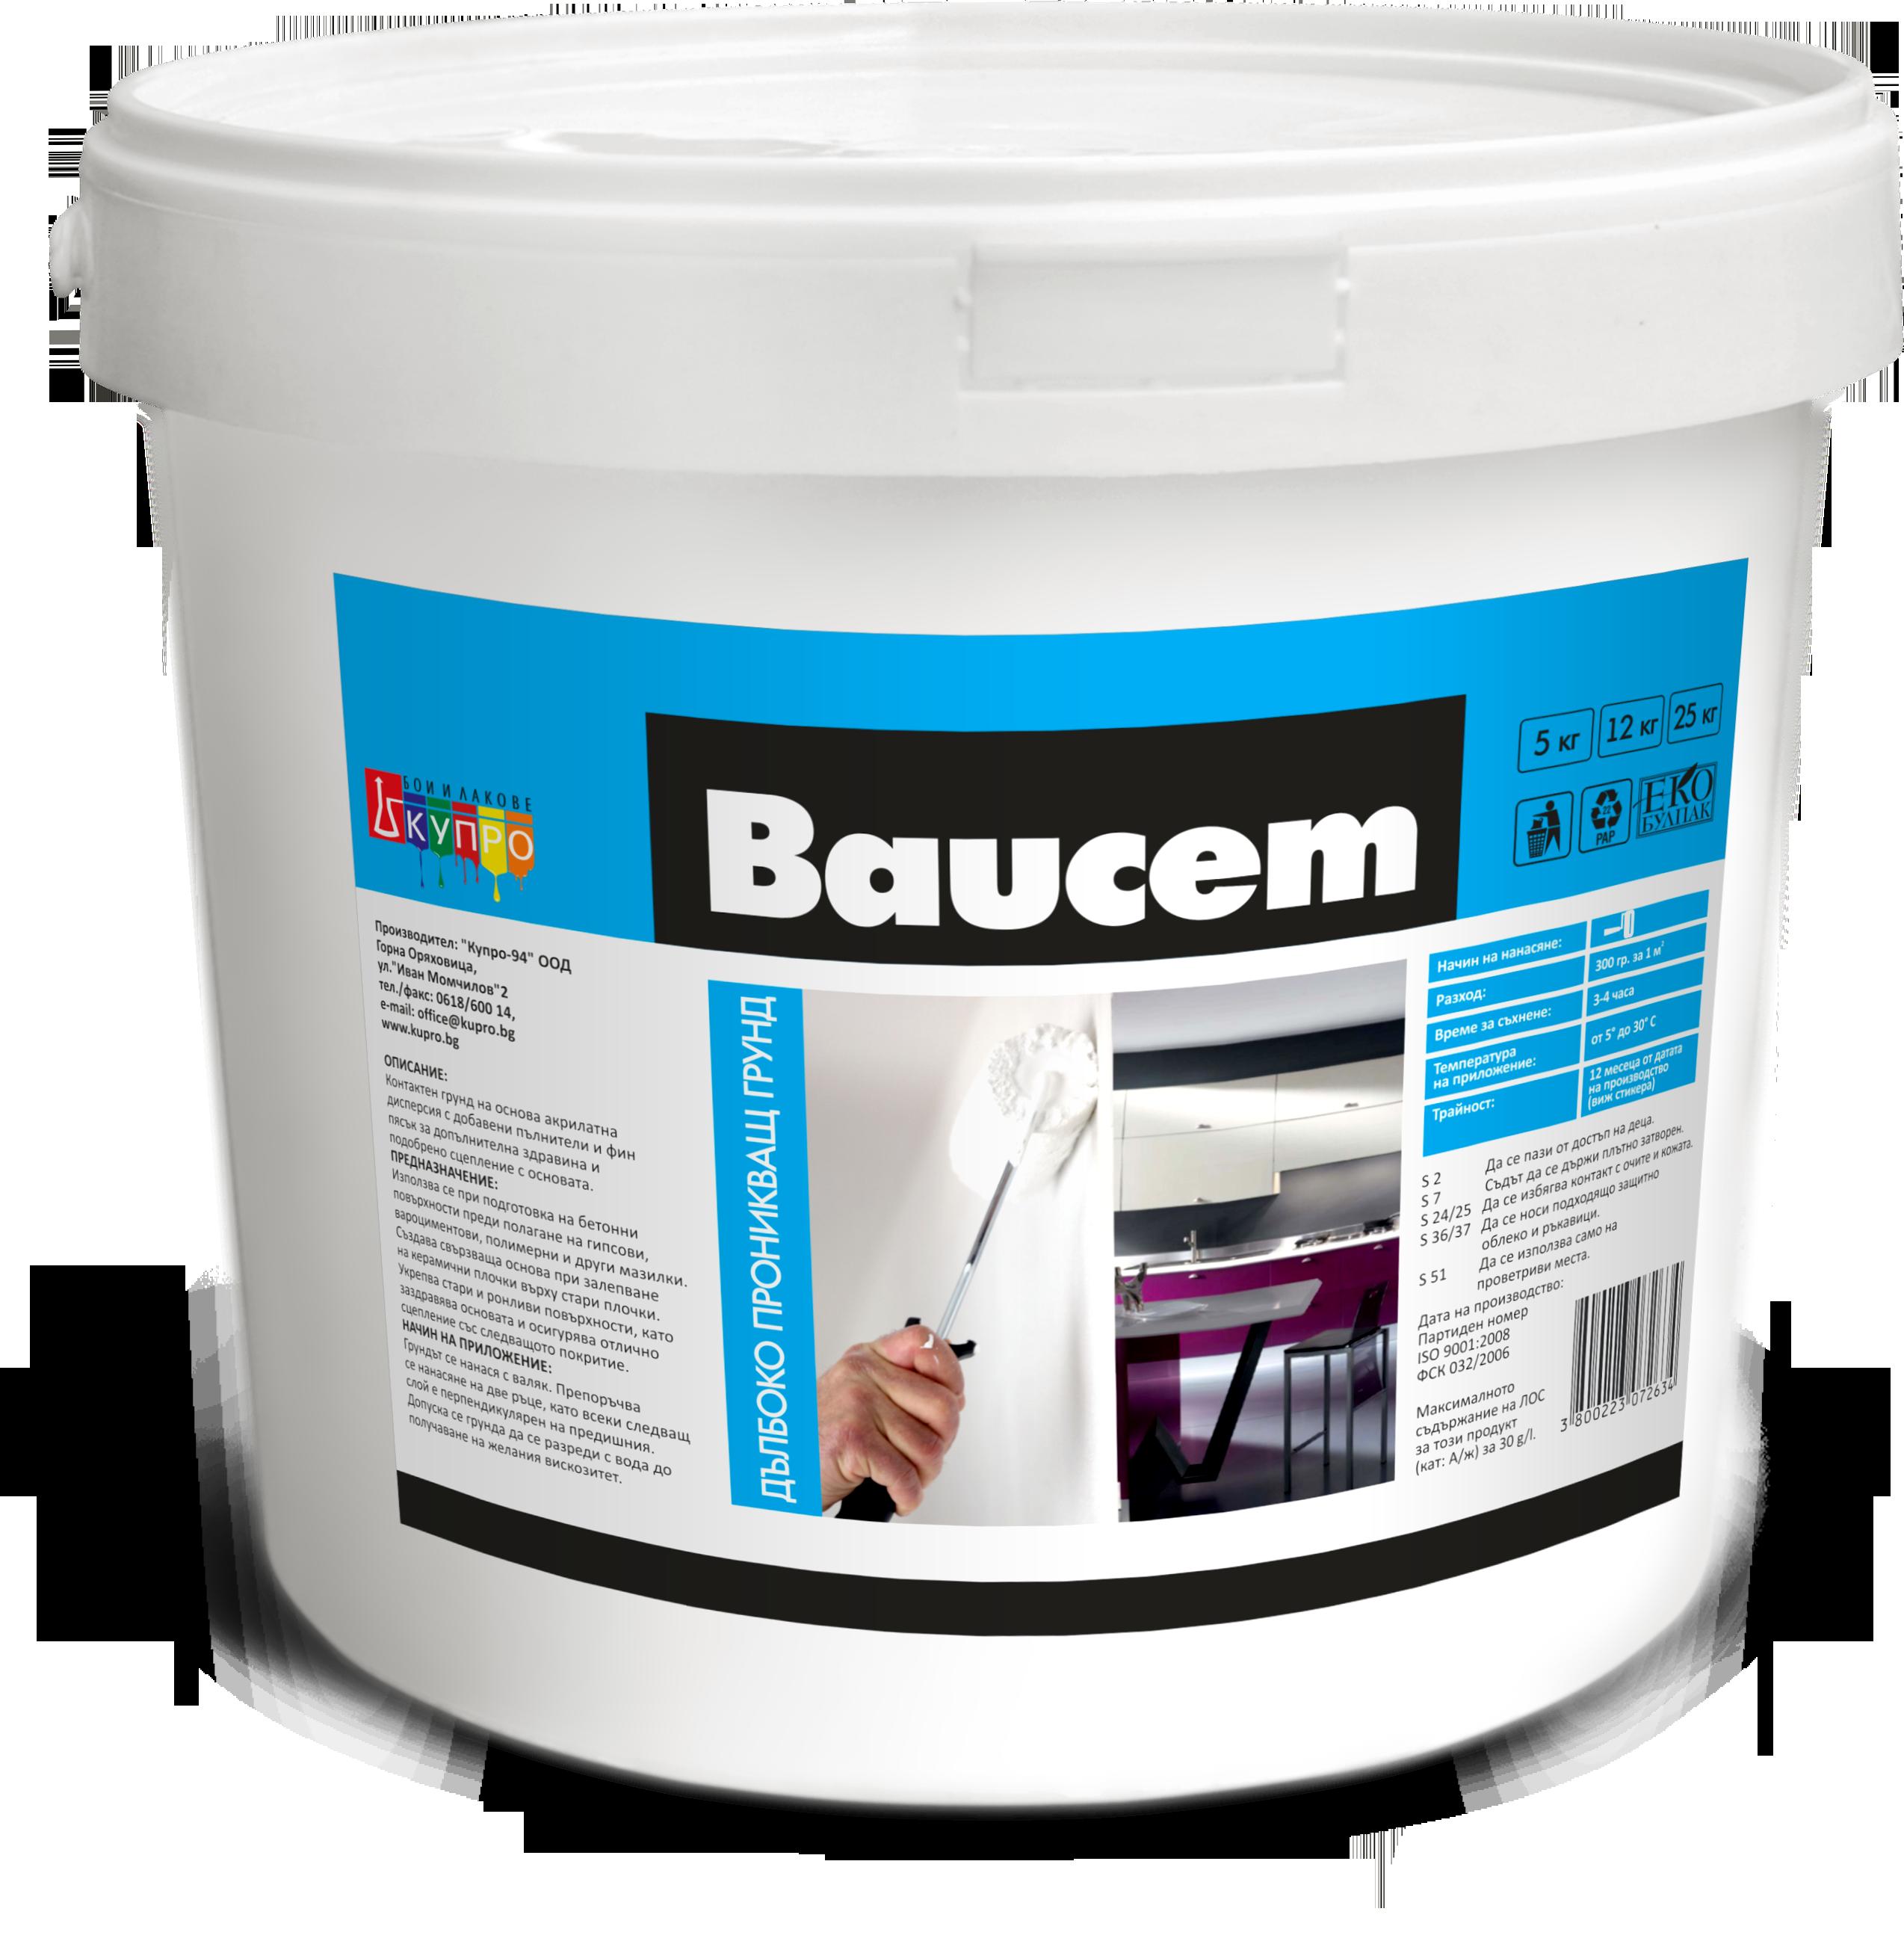 Baucem penetrating primer